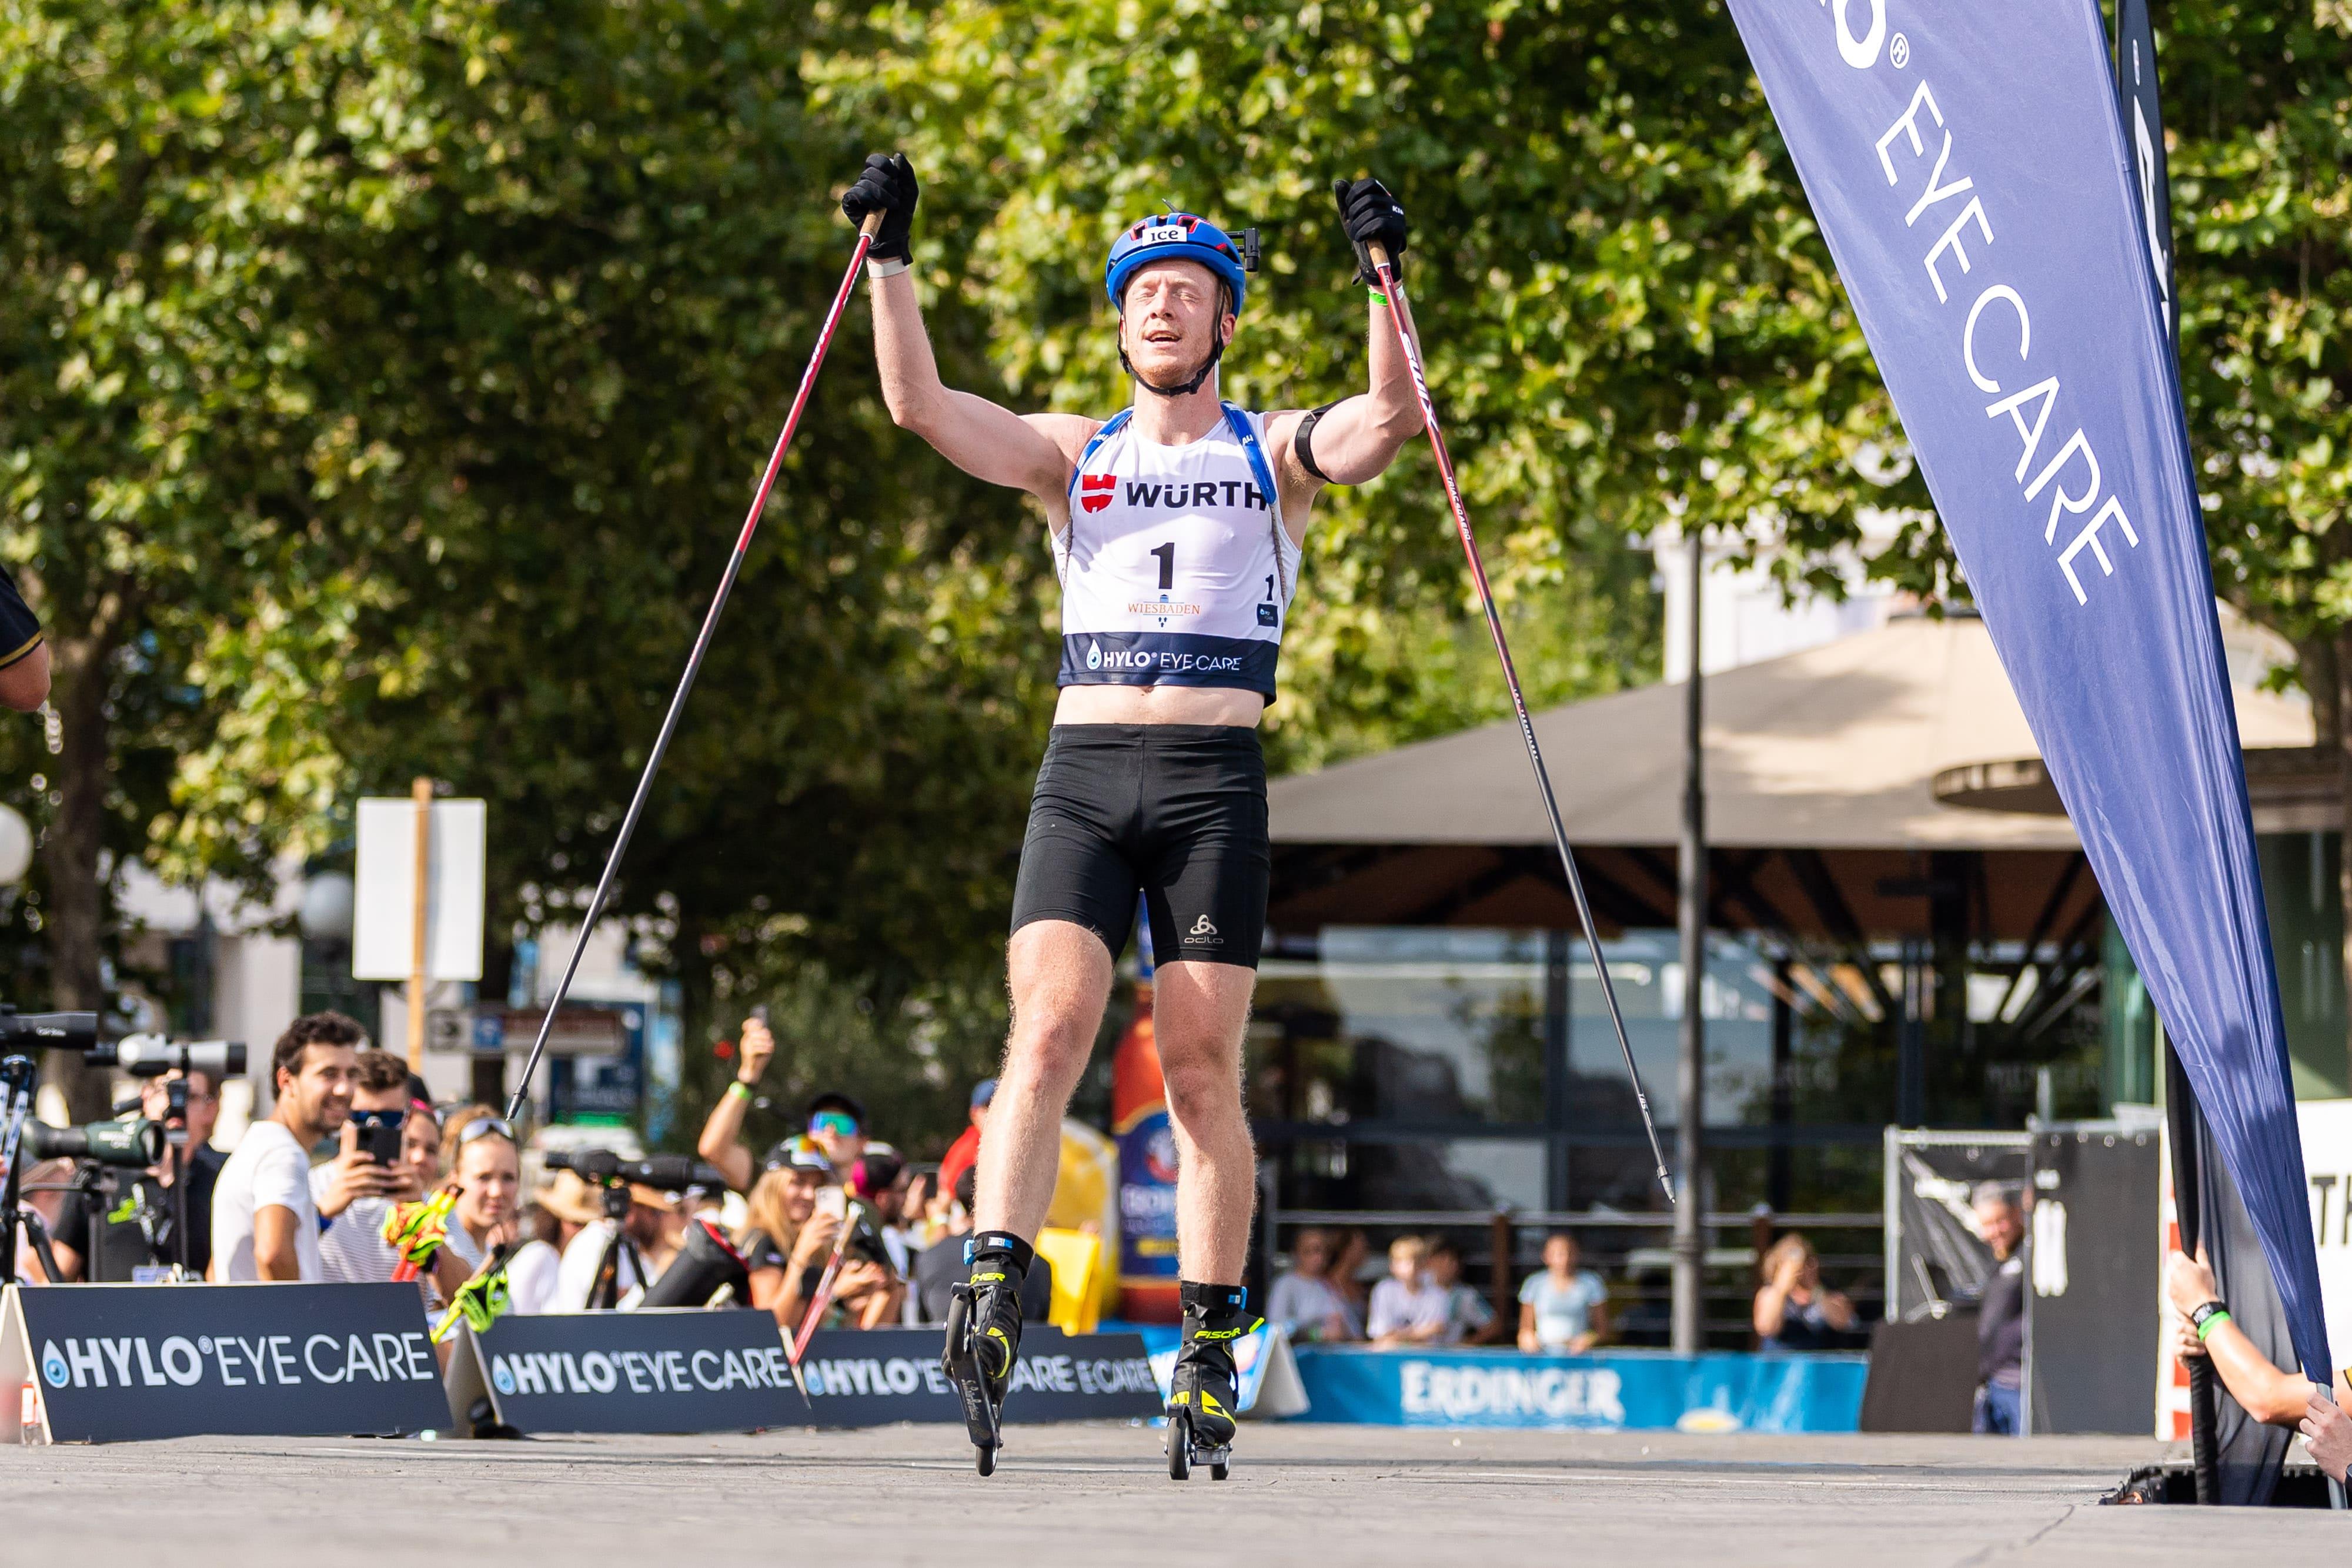 Johannes Thingnes Boe gewinnt den City-Biathlon in Wiesbaden